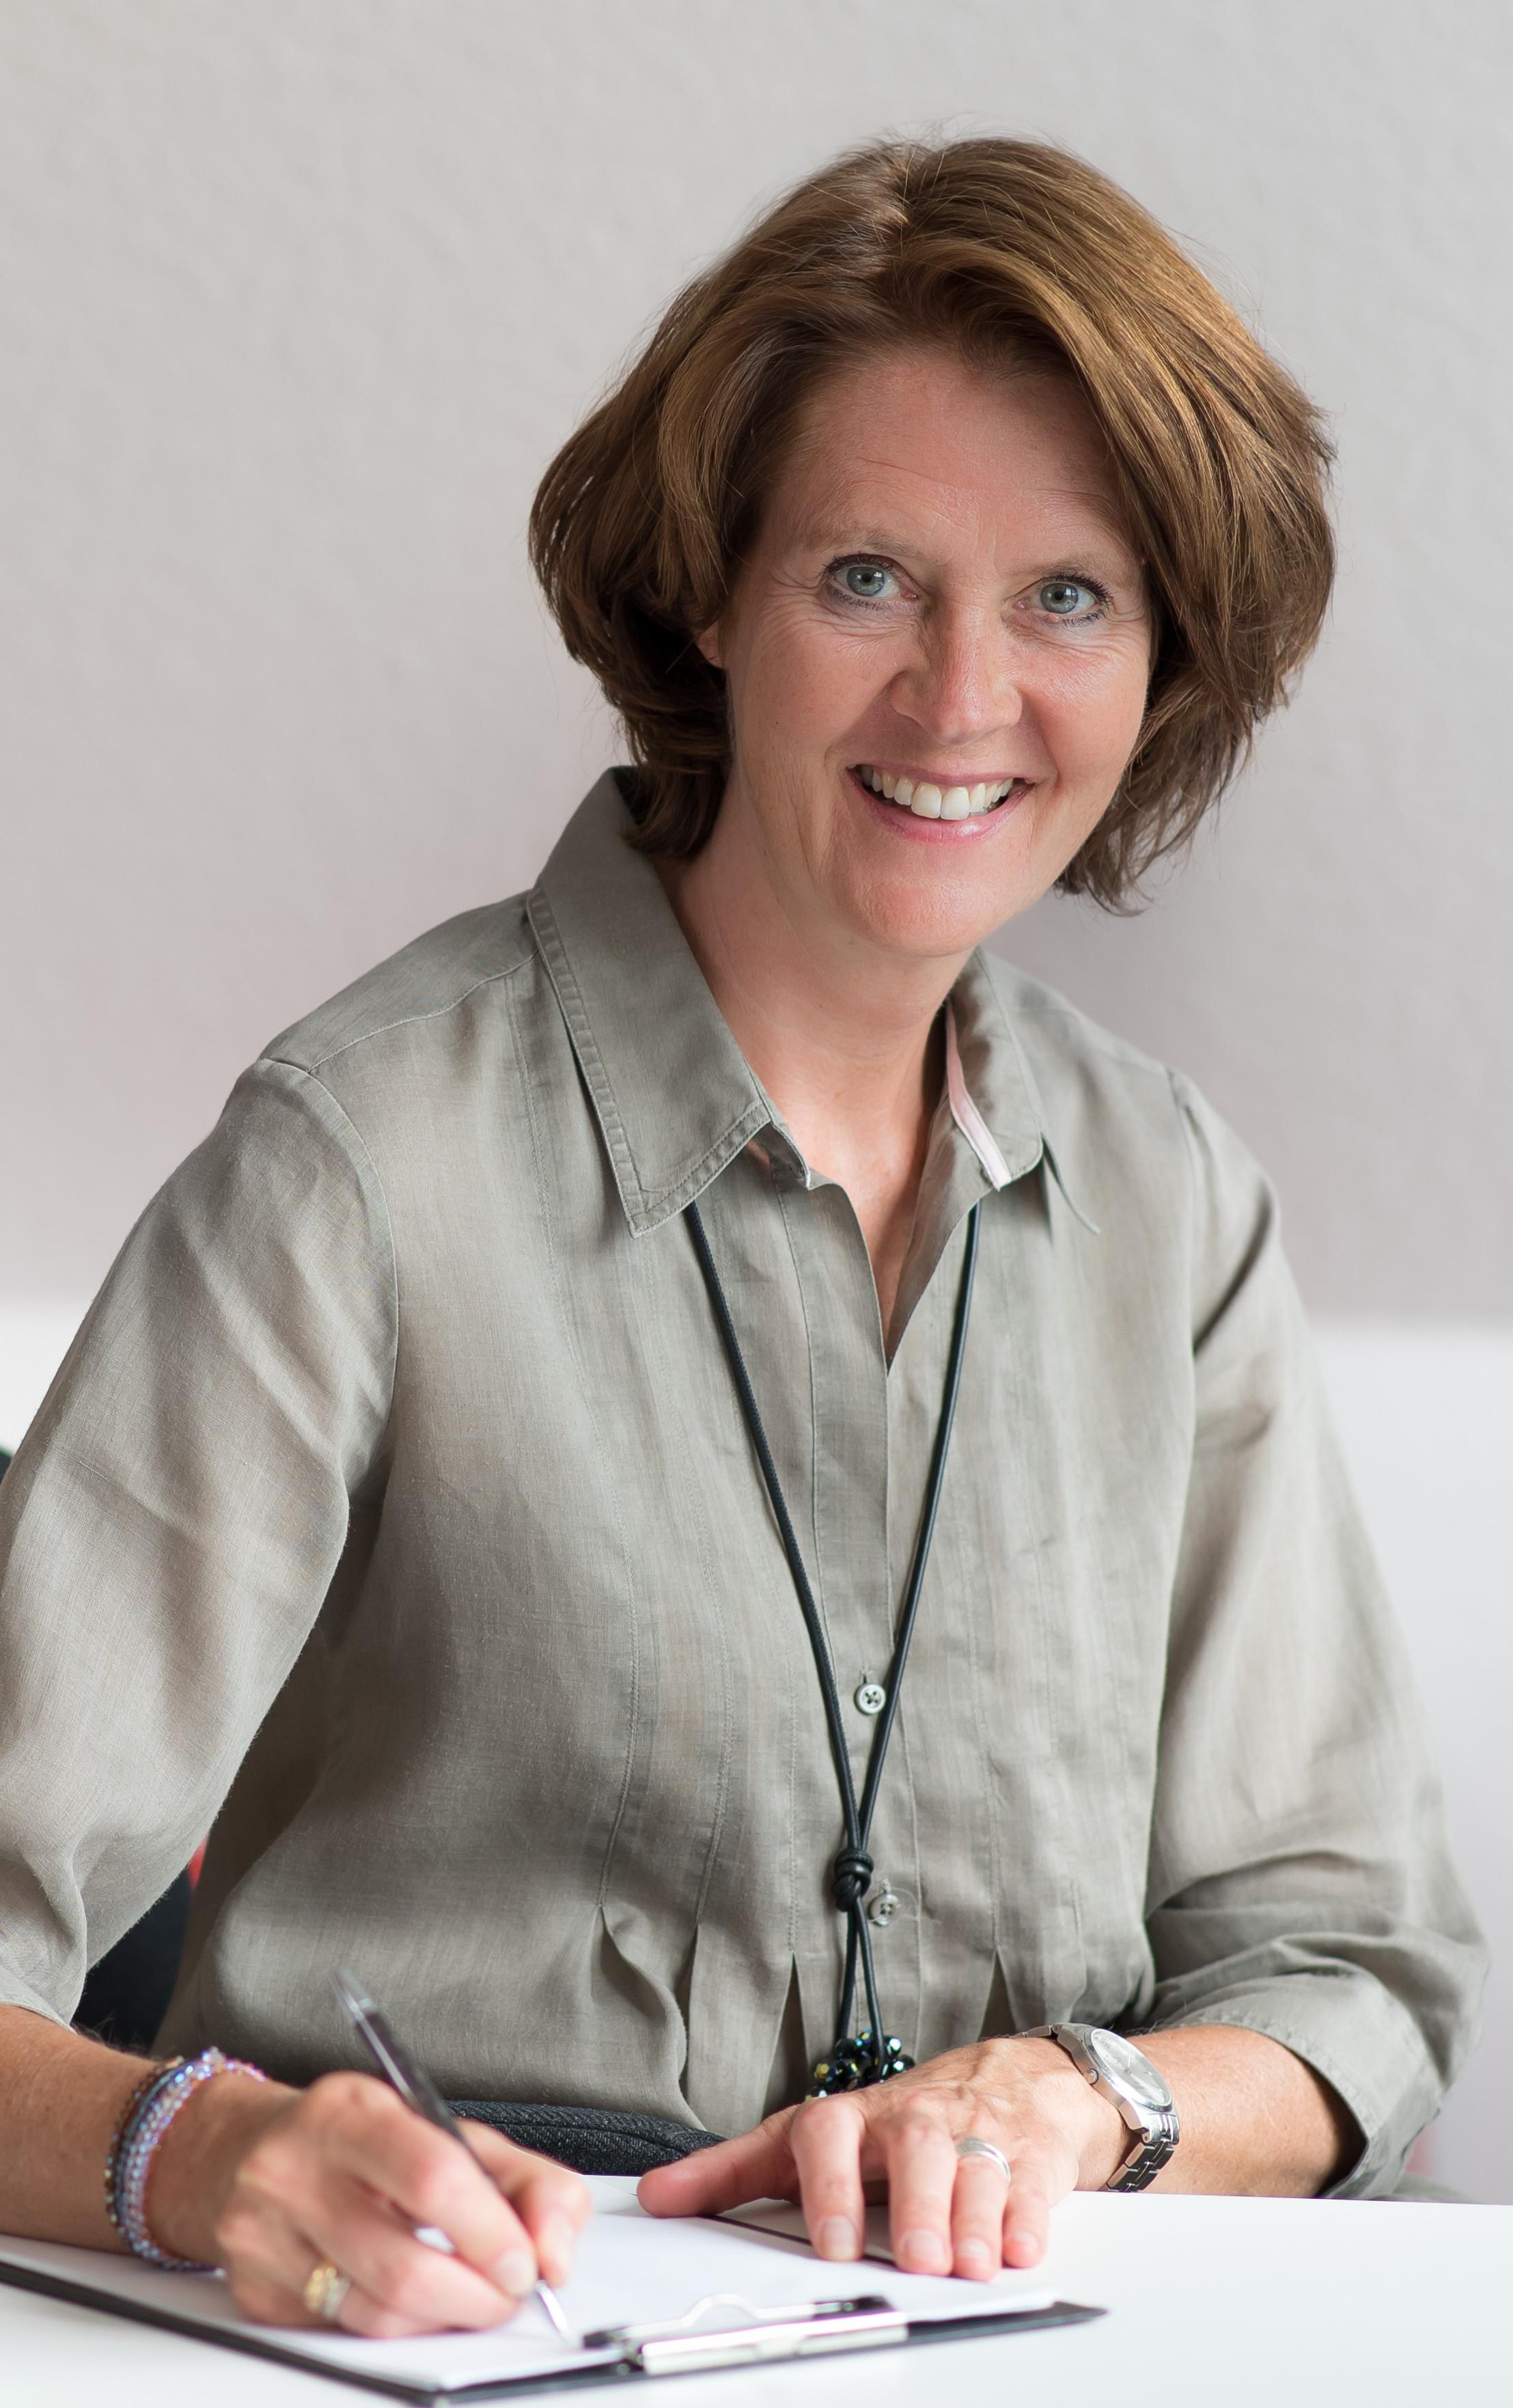 Stefanie Pollotzek